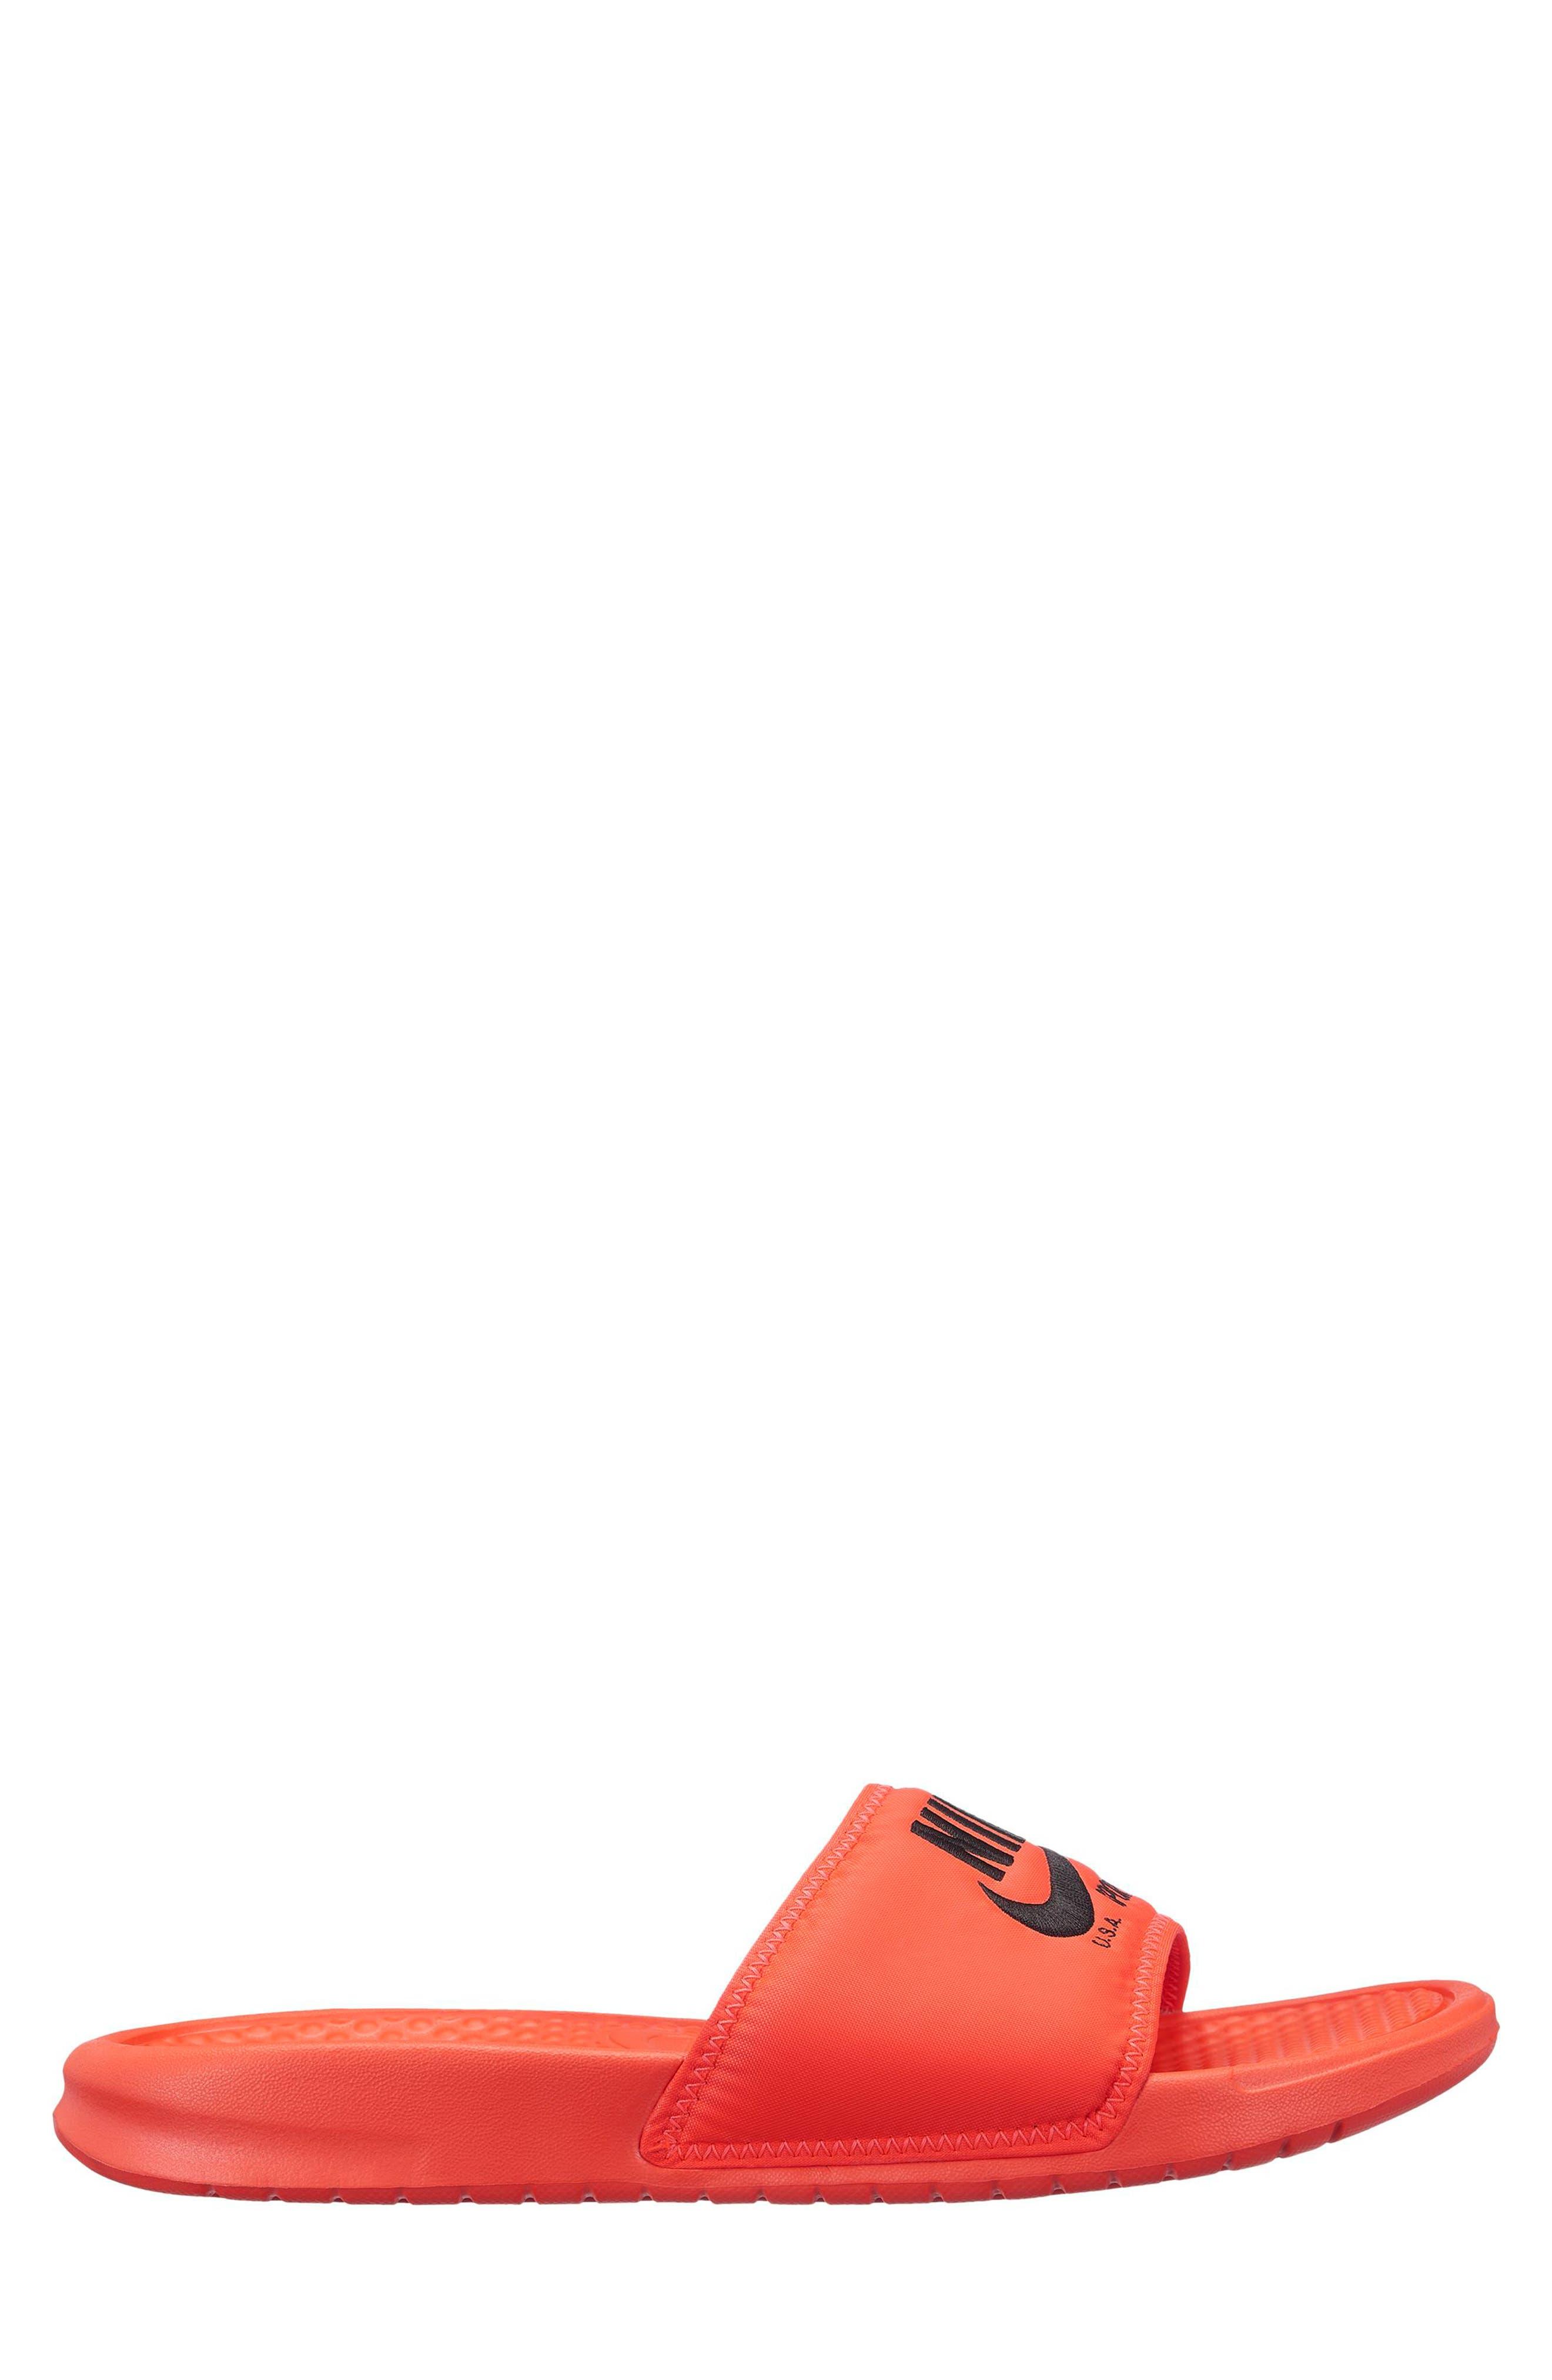 NIKE, Benassi JDI Slide Sandal, Alternate thumbnail 2, color, 600